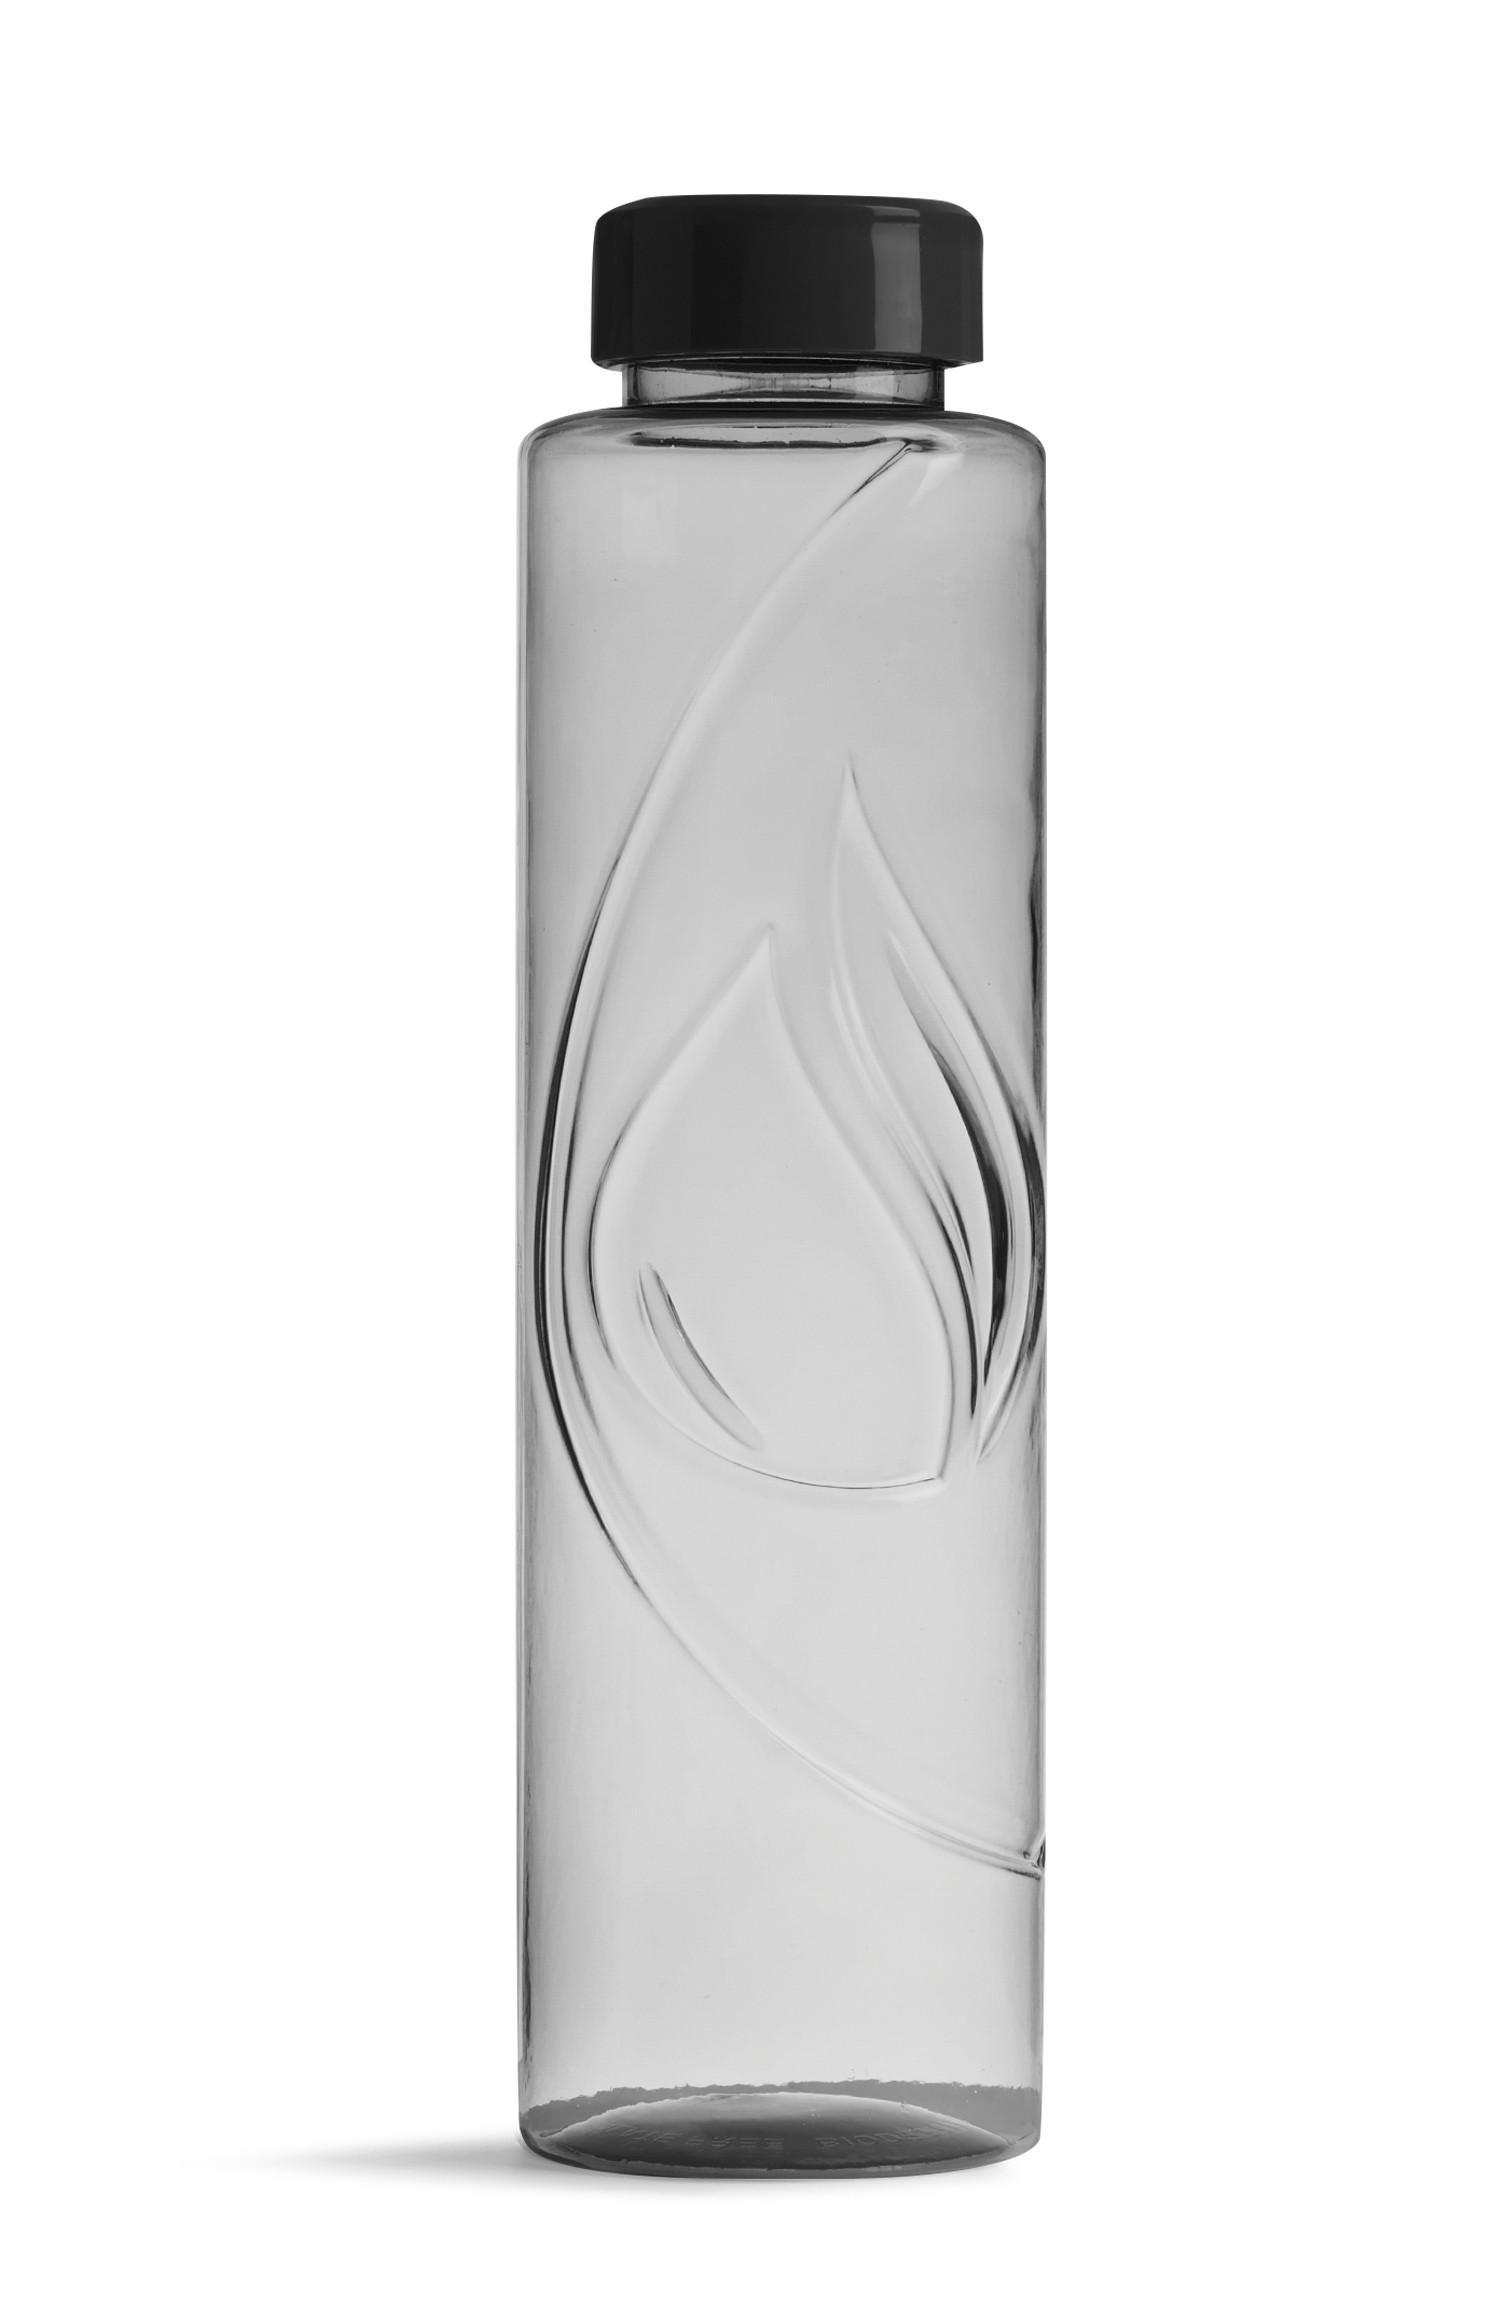 Garrafa biodegradável cinzento